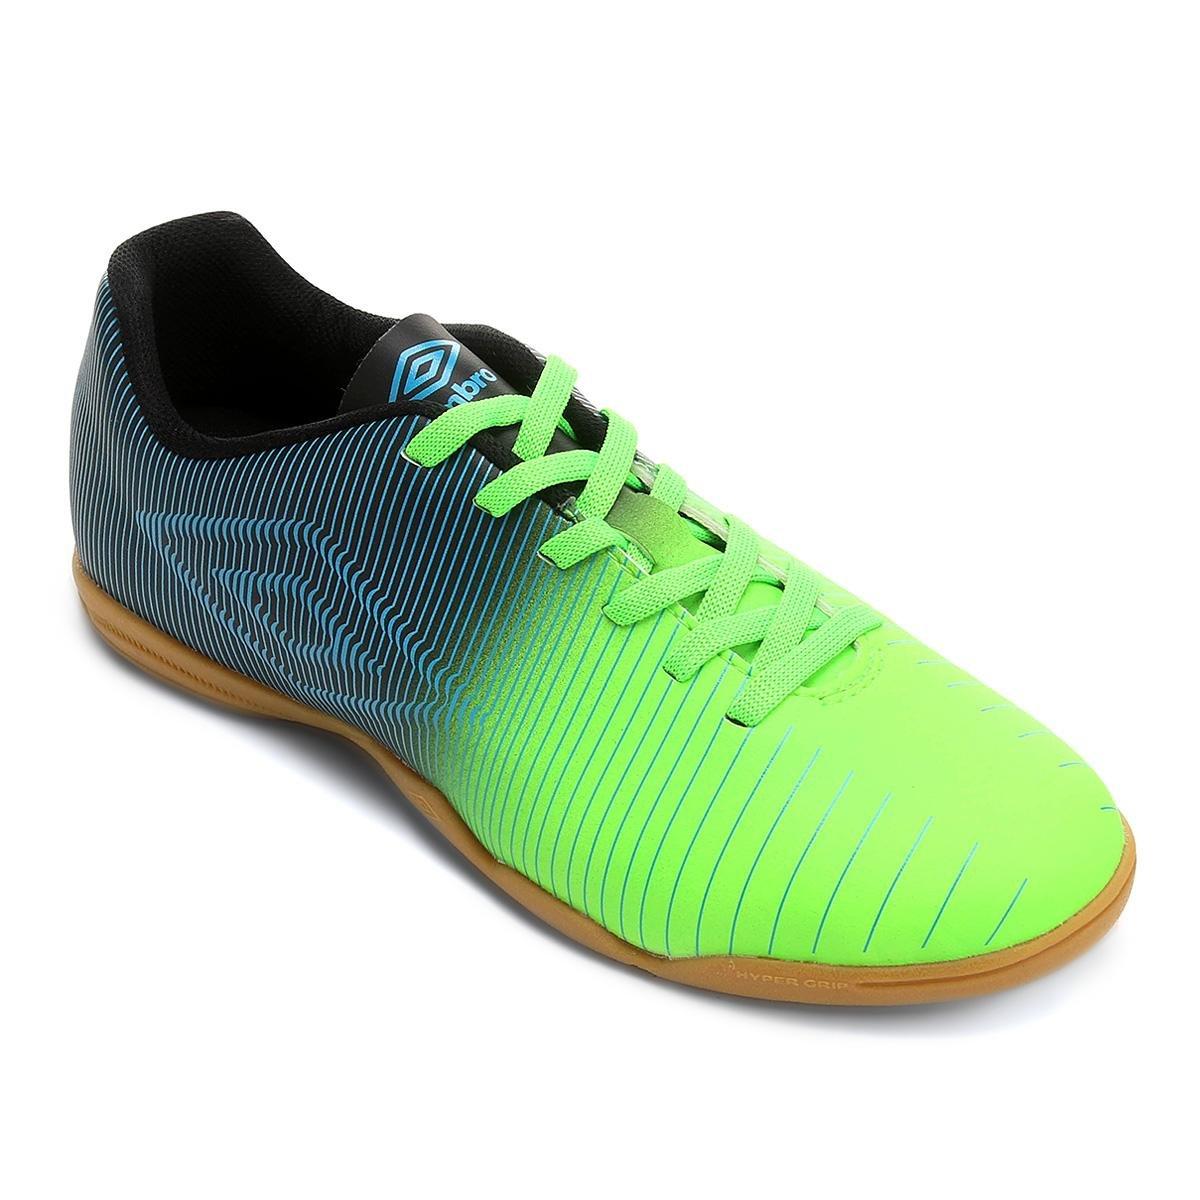 a94858b960790 Chuteira Futsal Umbro Vibe Masculina - Compre Agora